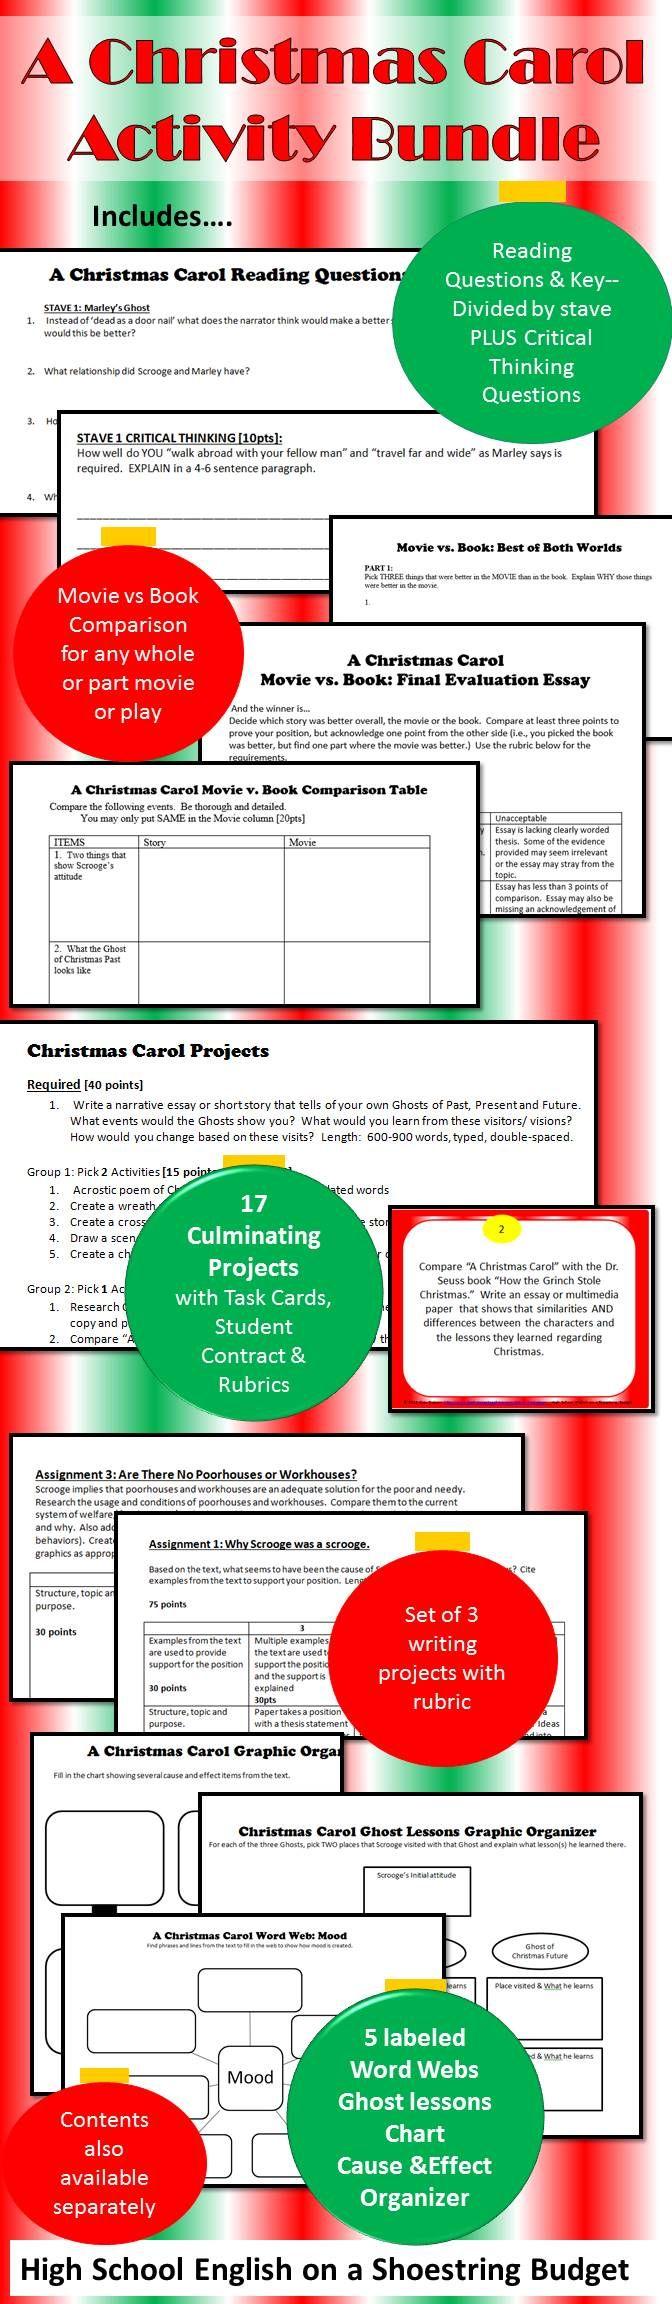 A Christmas Carol Activity Bundle (Charles Dickens) PDF